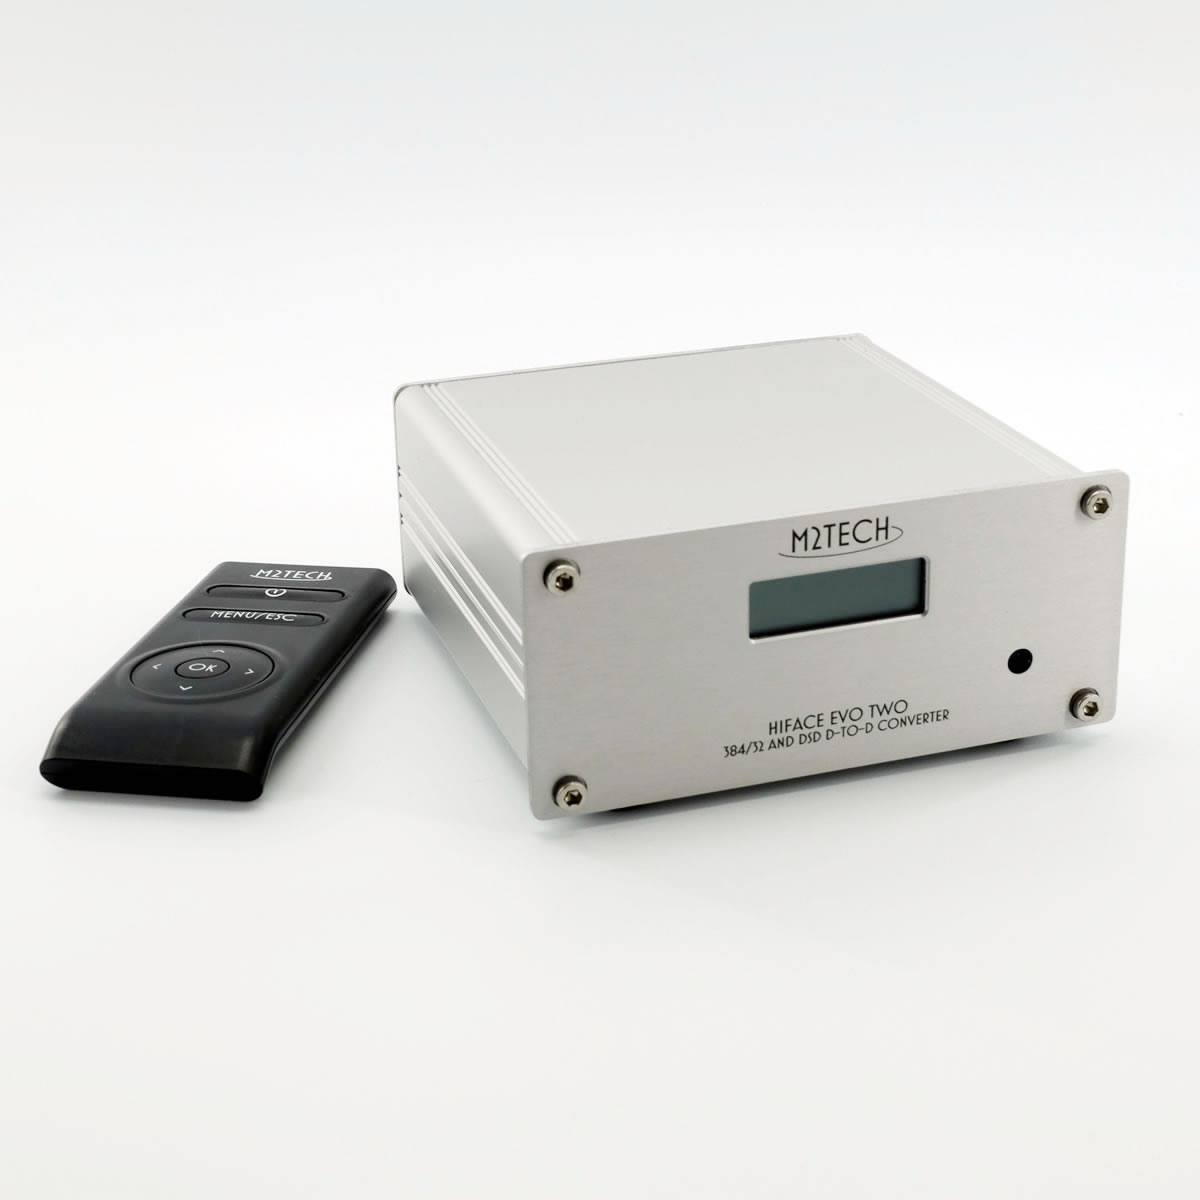 M2tech Manunta Hiface Evo Two Usb To Spdif Converter Voltagecontrolledcurrentsink Addaconvertercircuit Circuit